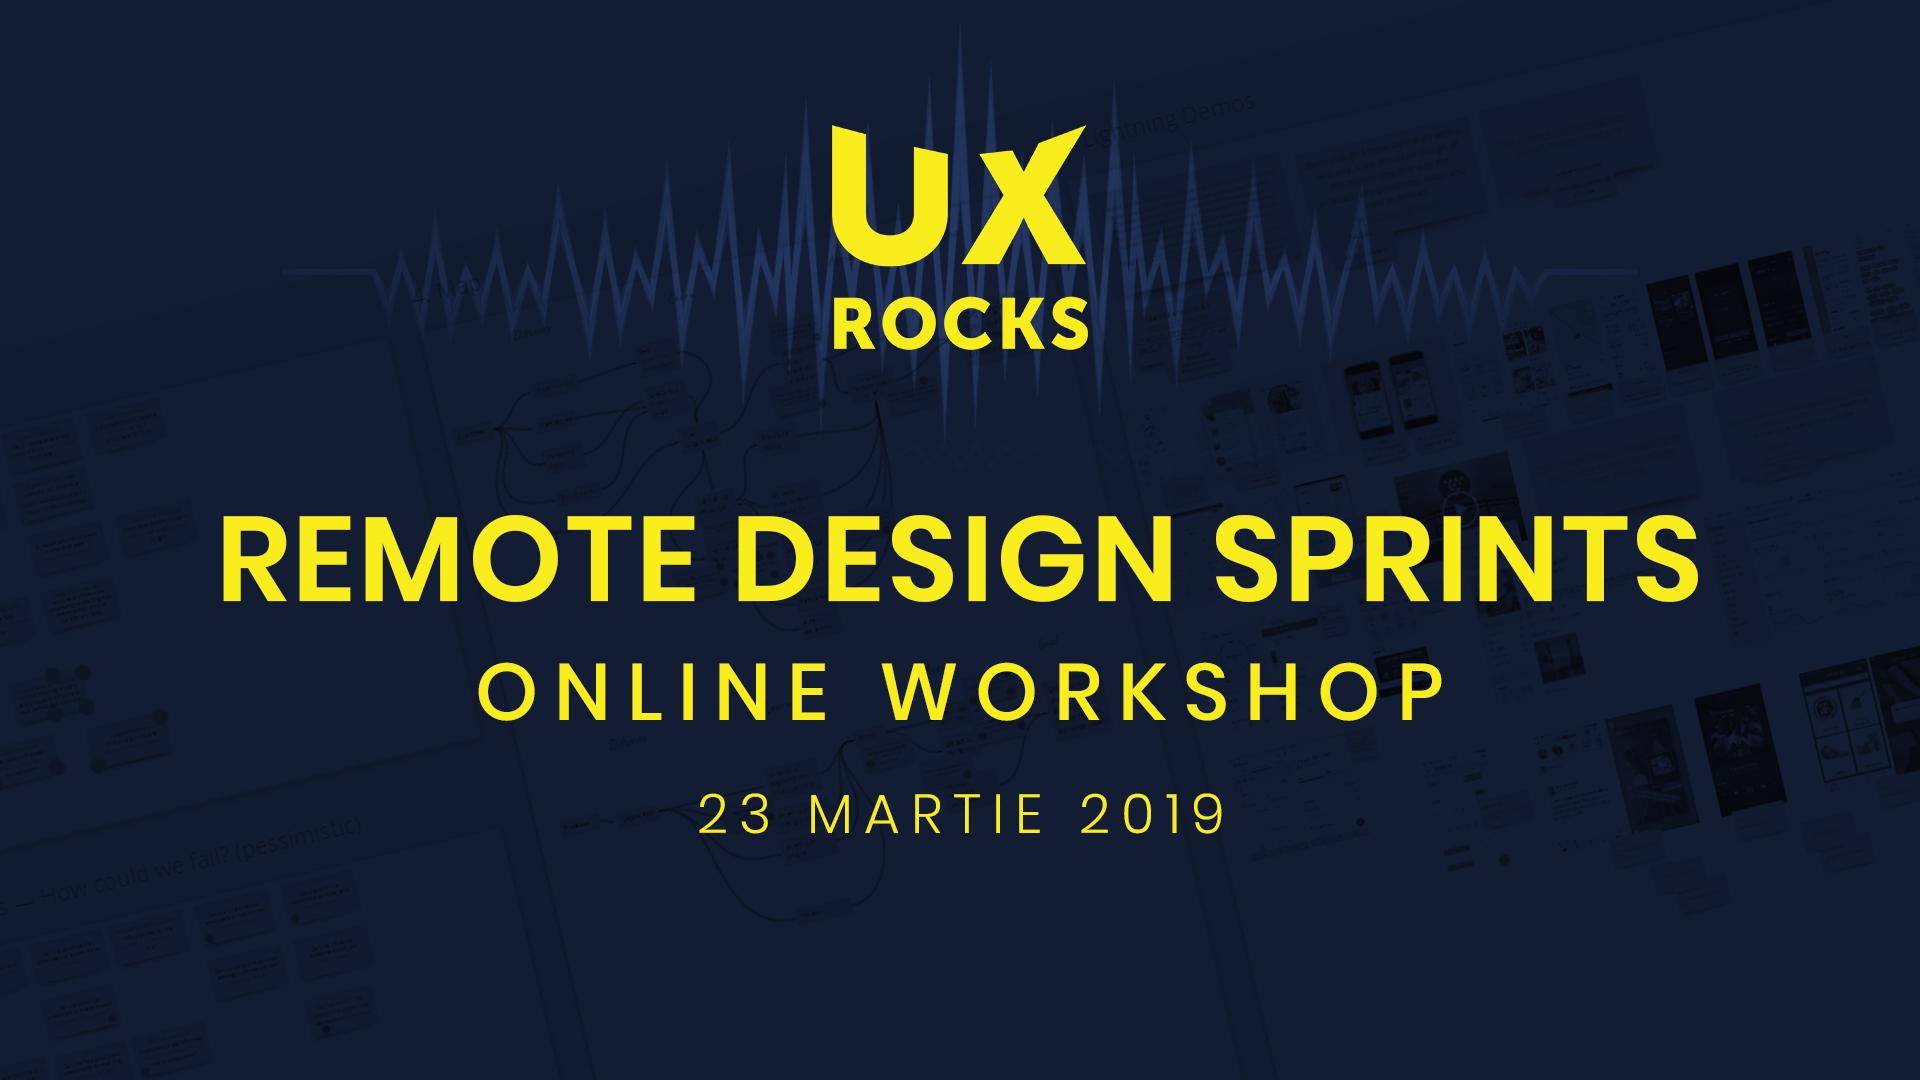 Remote Design Sprint – Online Workshop